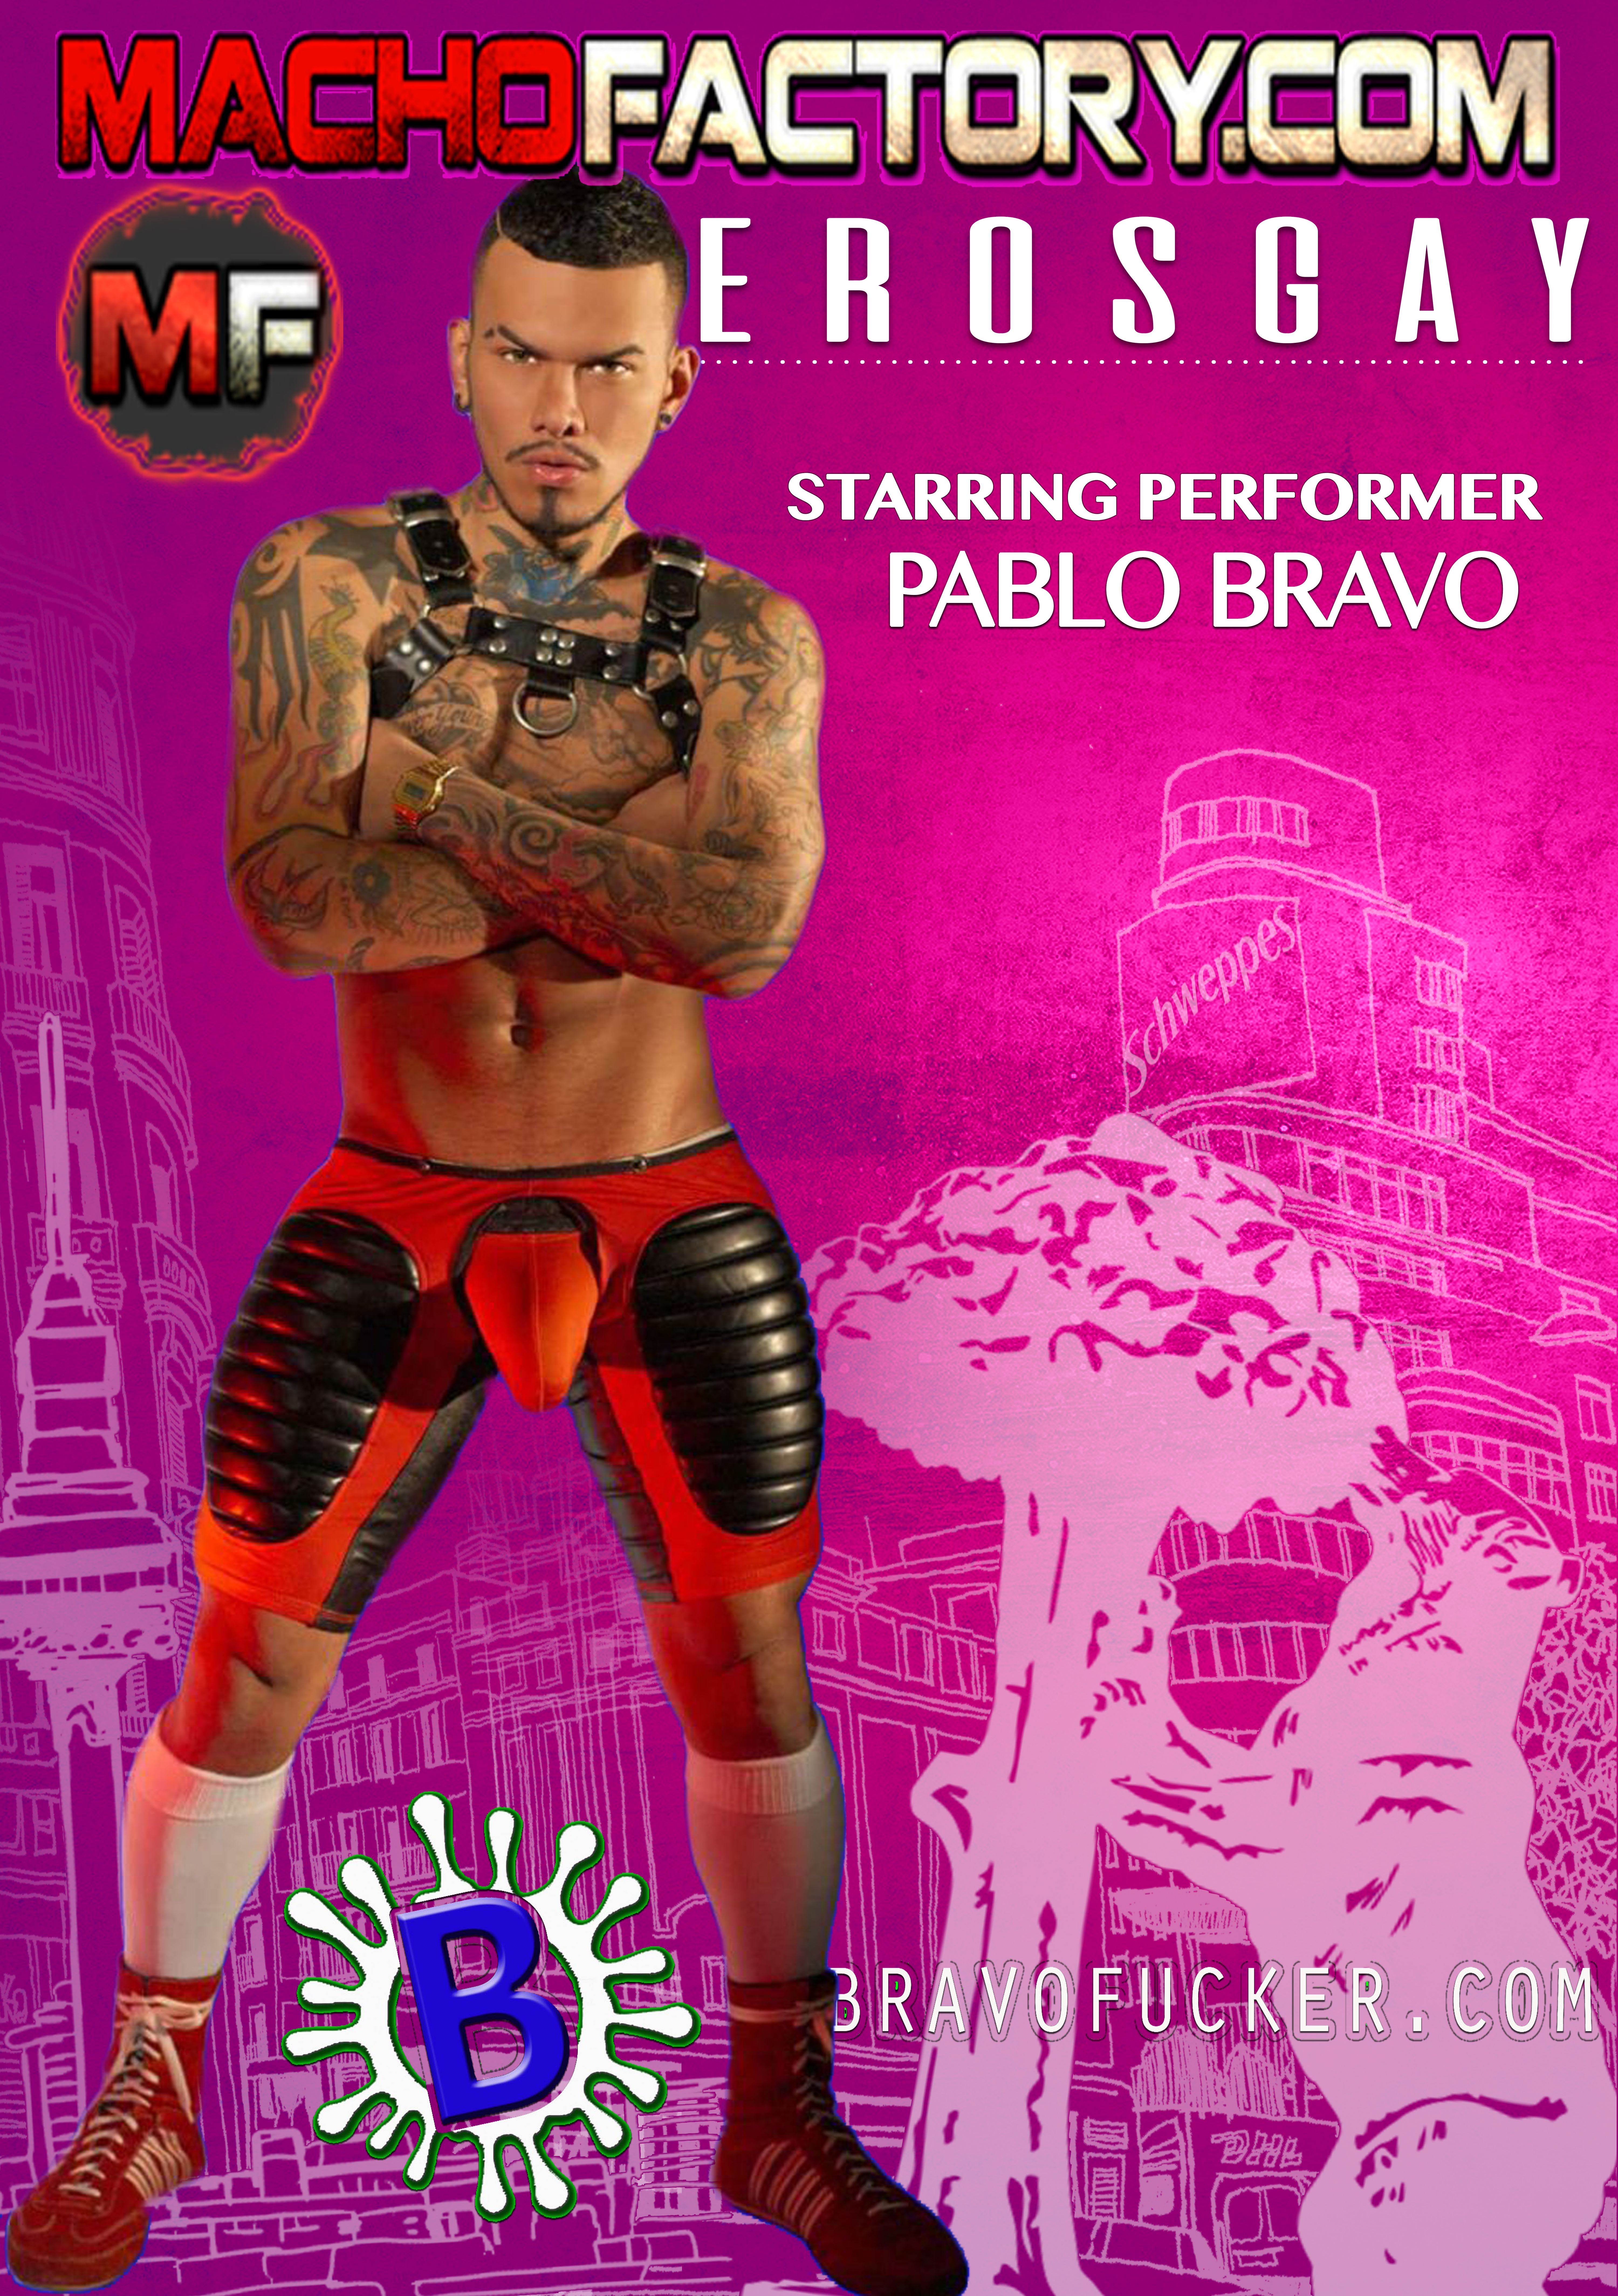 PABLO BRAVO